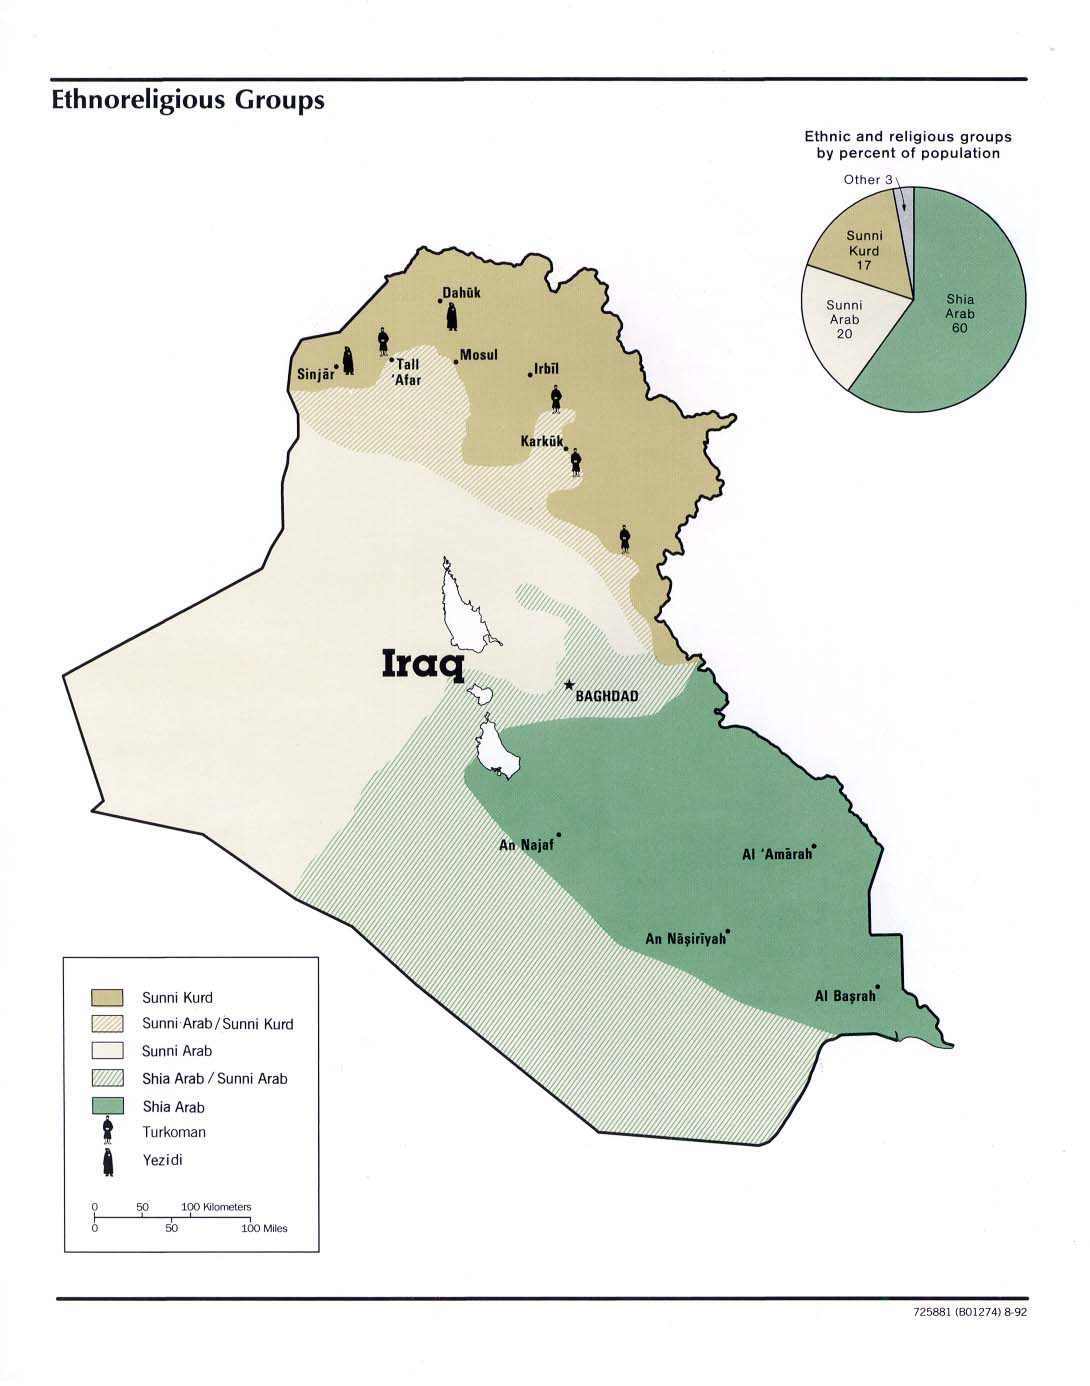 Muslims, Islam, and Iraq